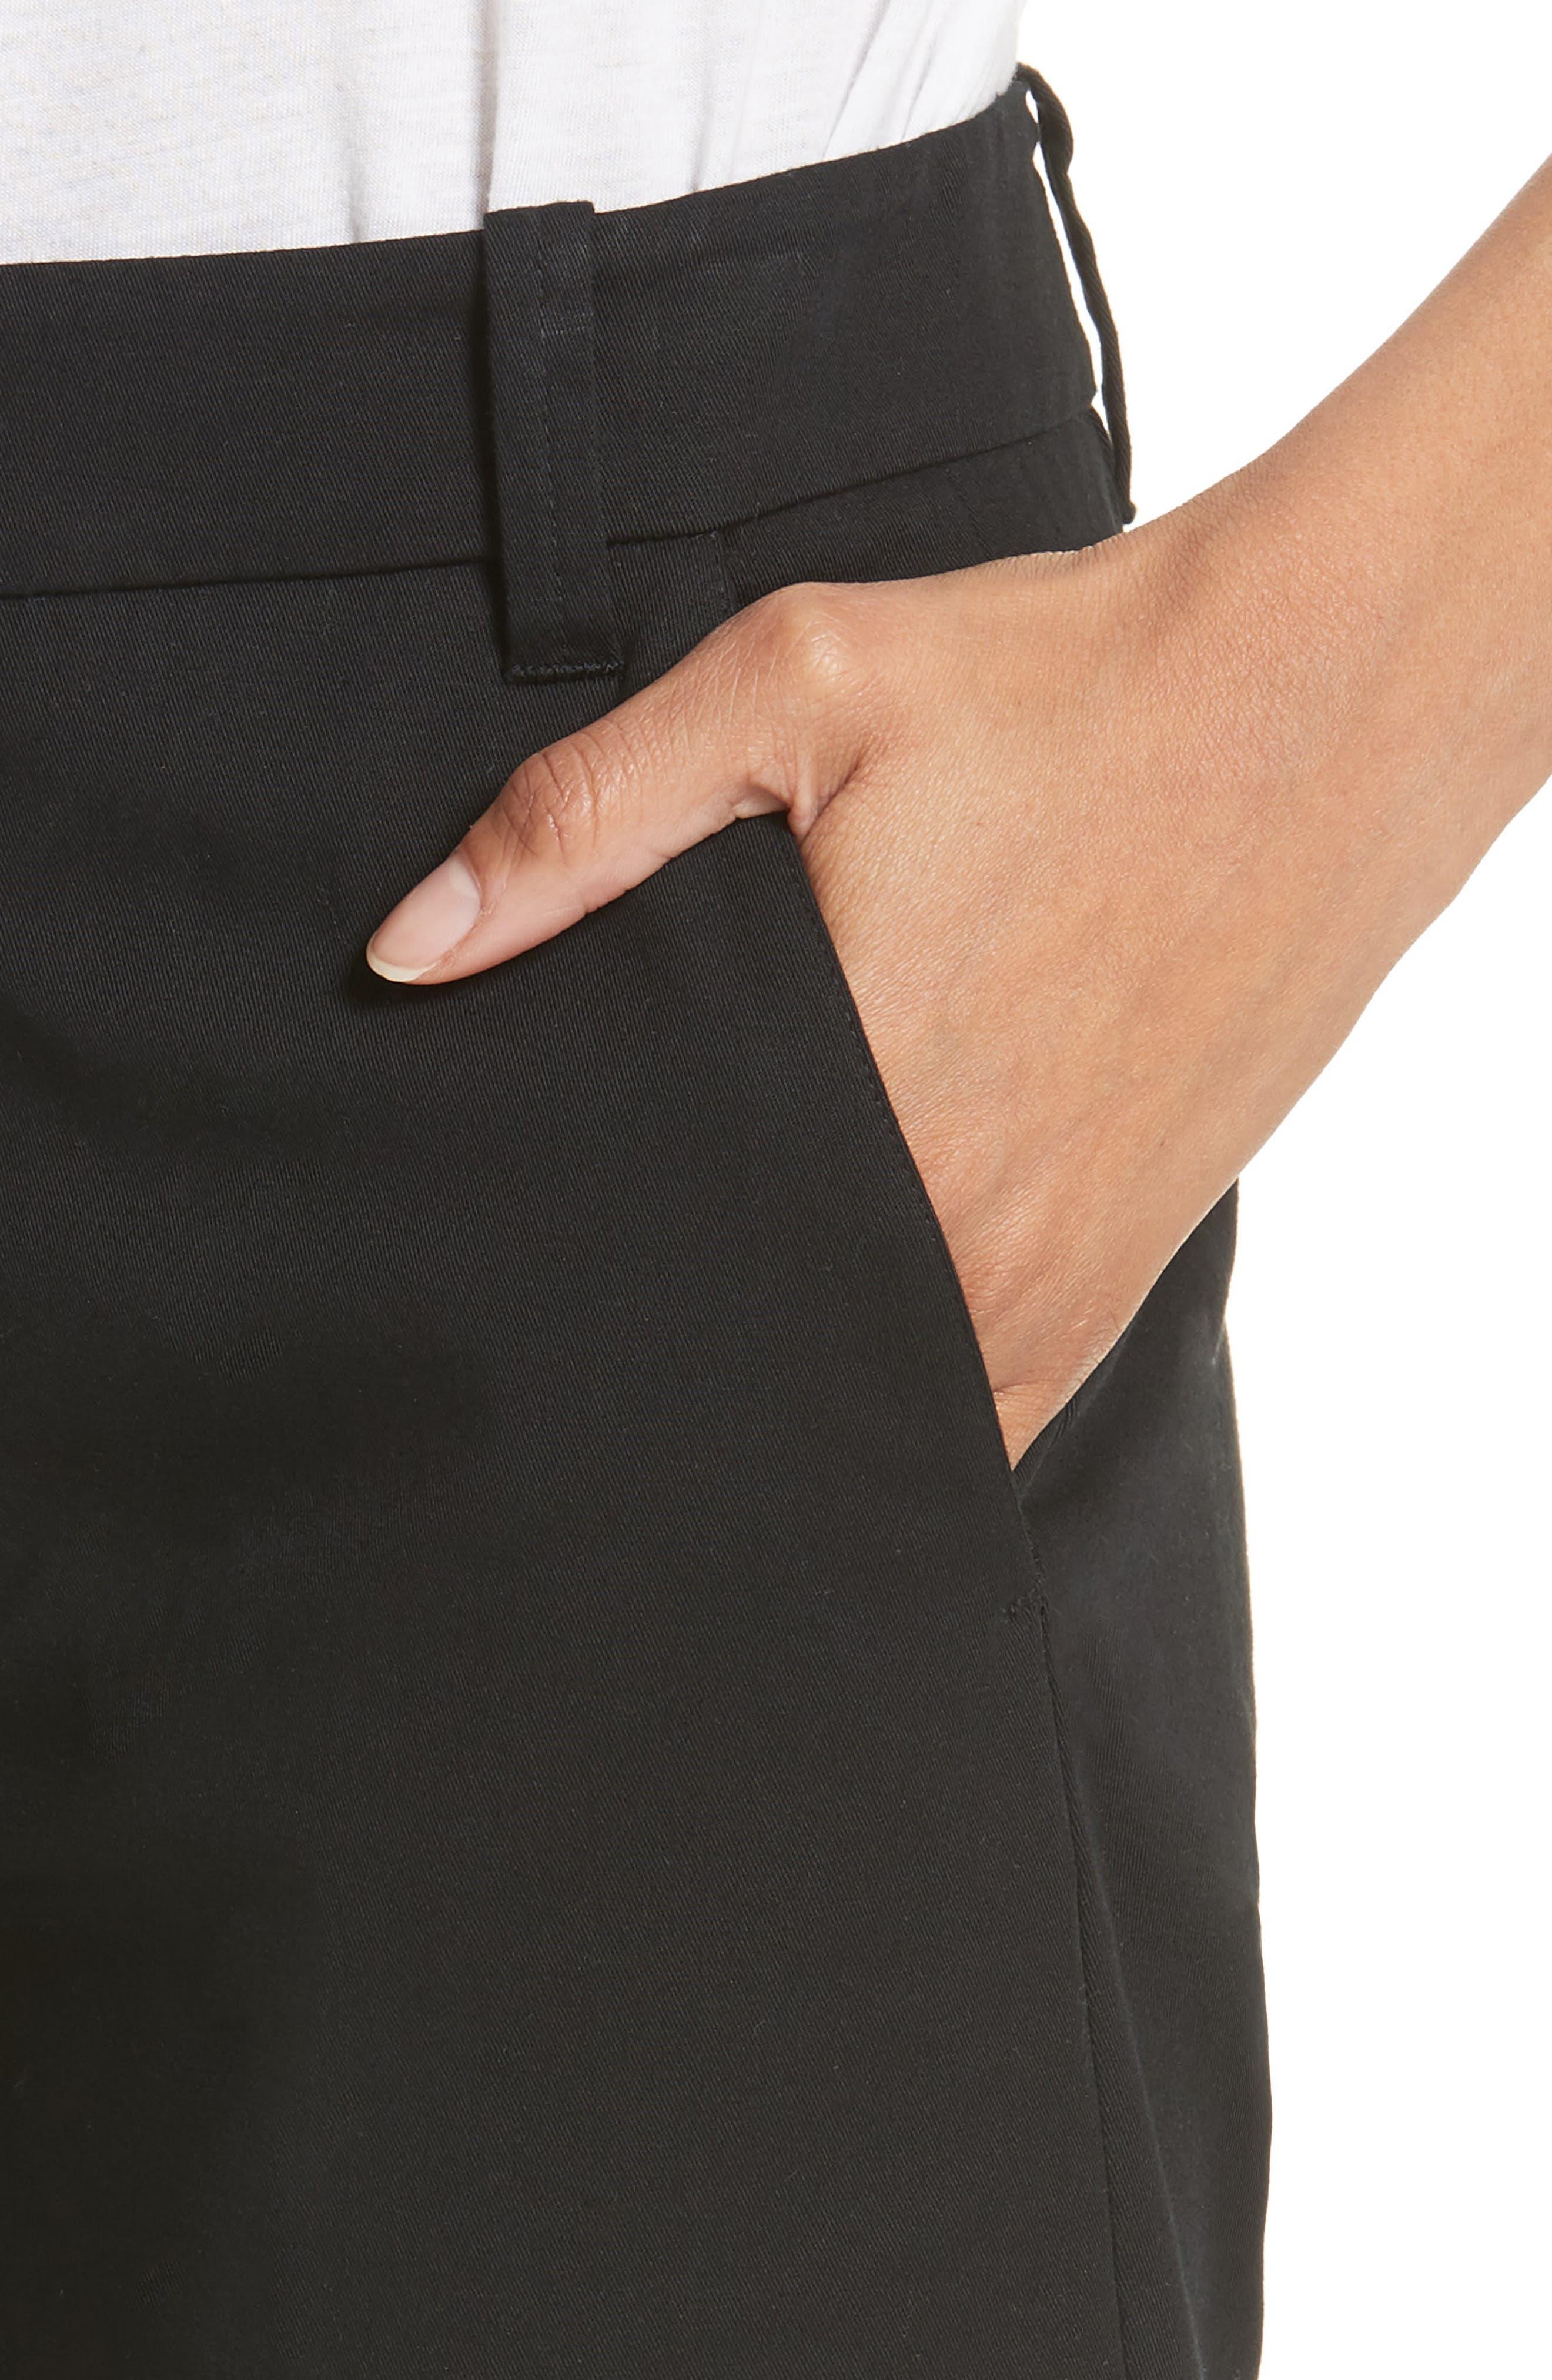 Bermuda Shorts,                             Alternate thumbnail 4, color,                             Black